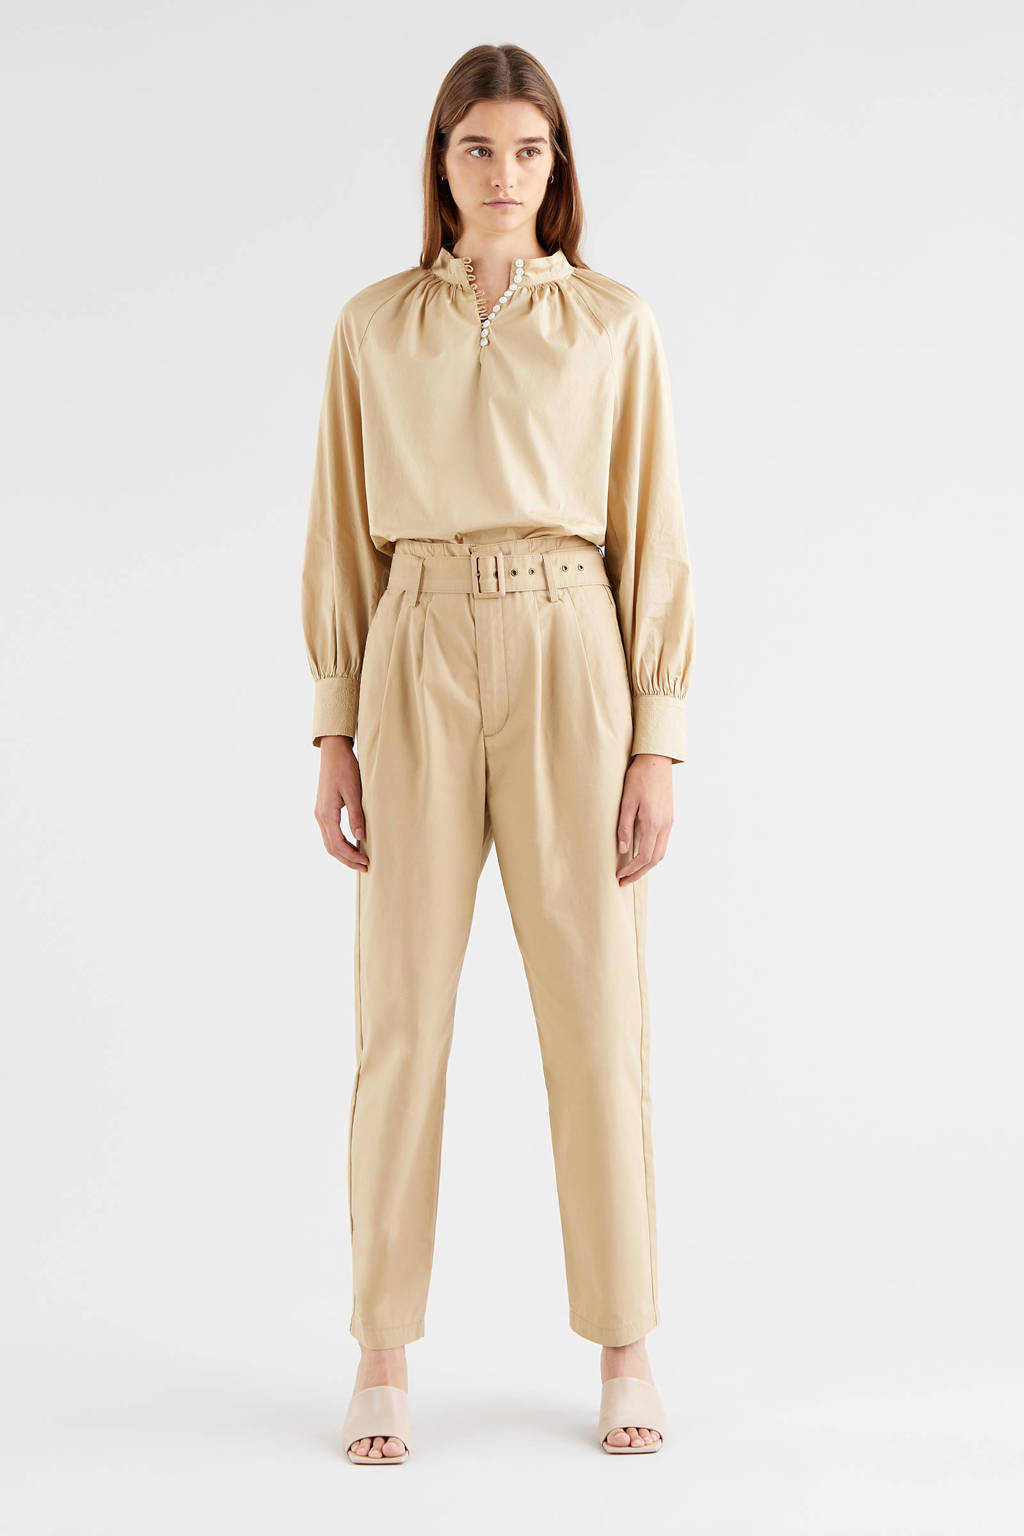 Levi's TAILOR HIGH LOOSE TAPER high waist tapered fit broek beige, Beige